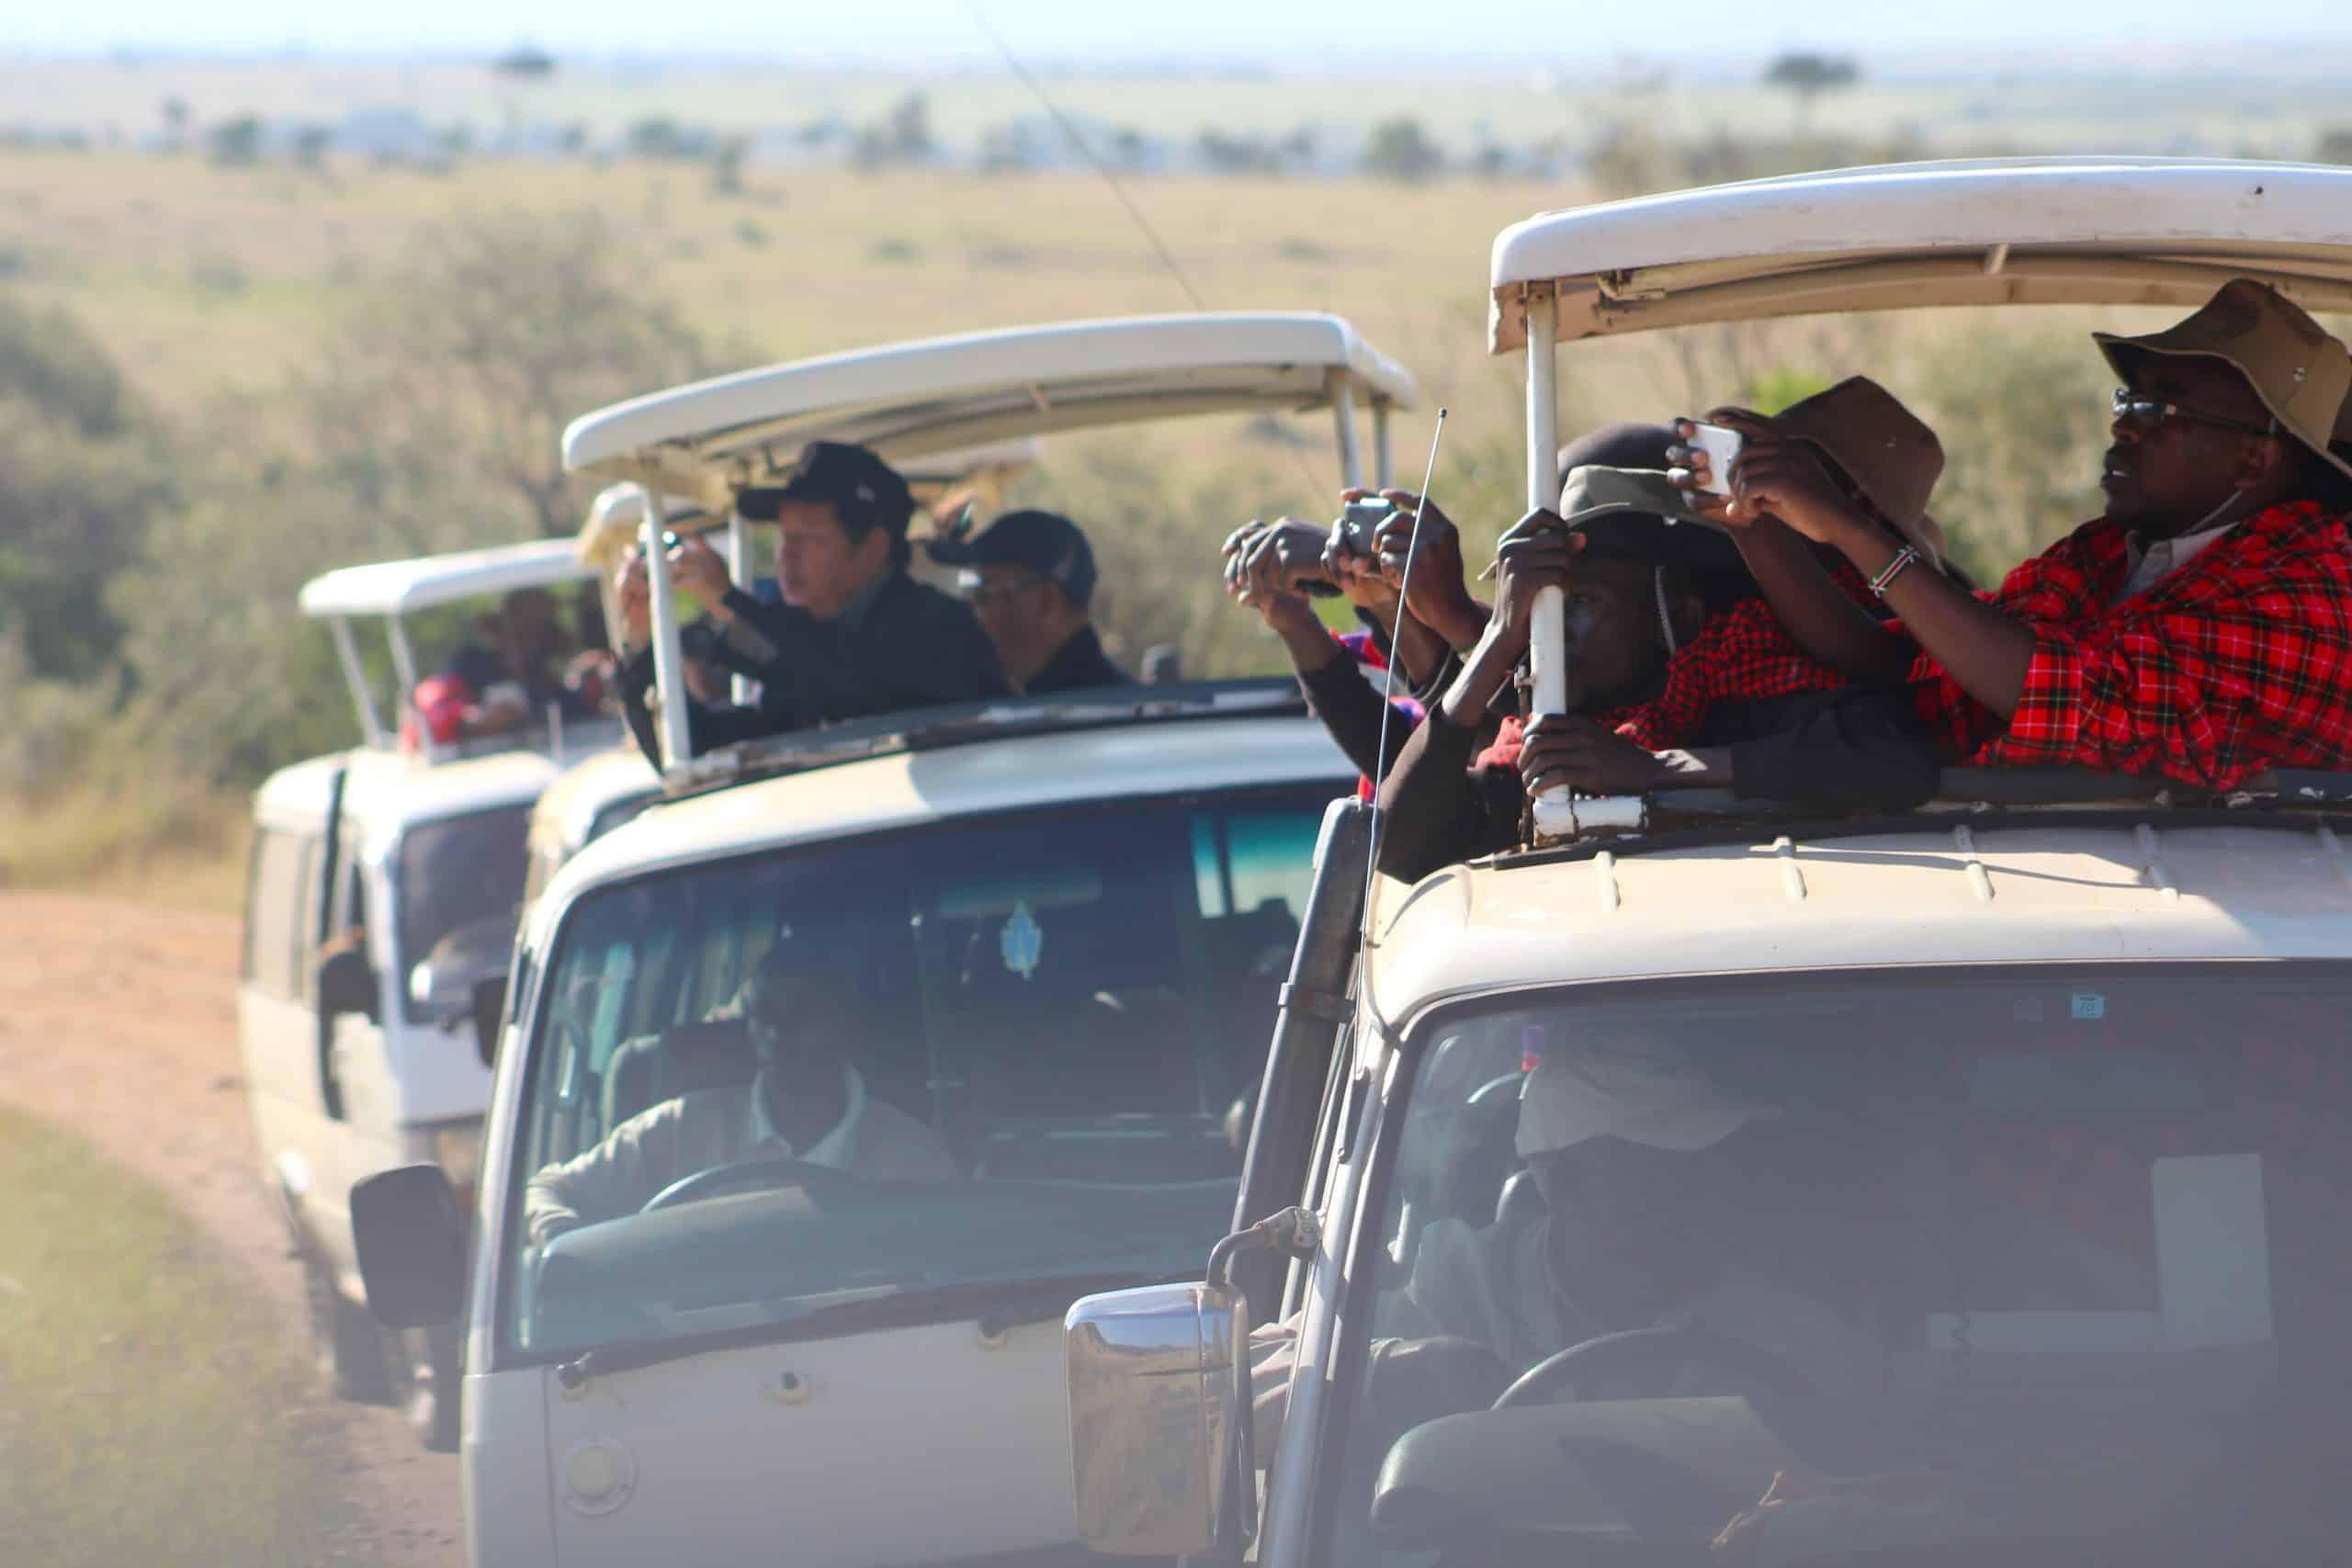 Burigi Chato Safaris Co. Ltd Serengeti Norongoro Safari Best Tour Agency Company Operator In Moshi Arusha Tanzania Africa) (234)